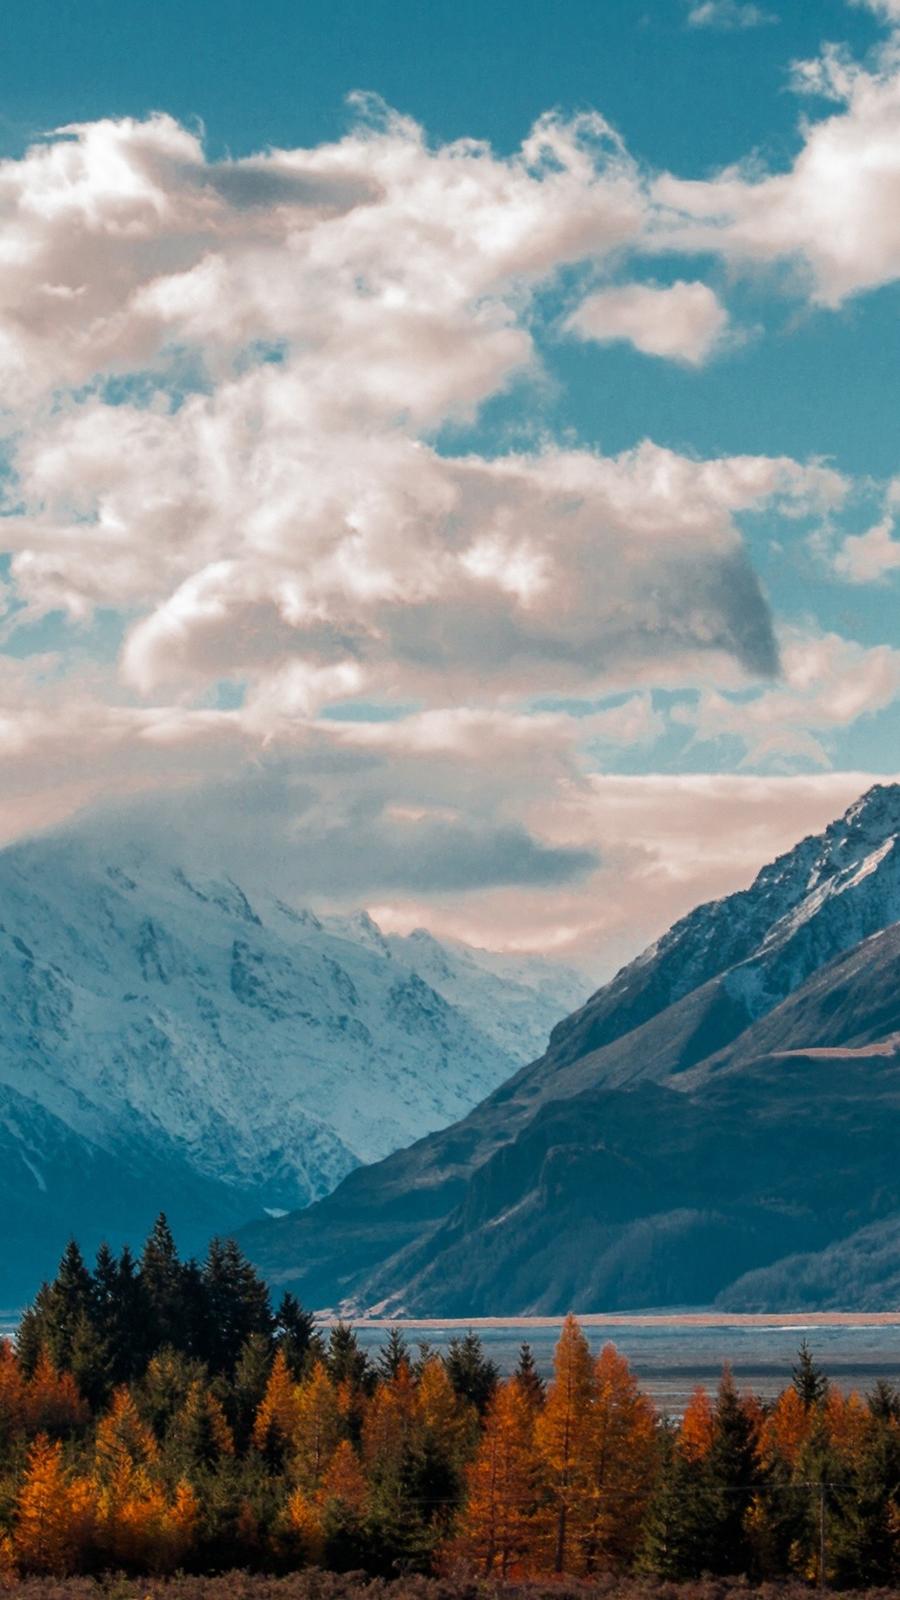 4K Mountain & Nature Series Wallpapers Free Download